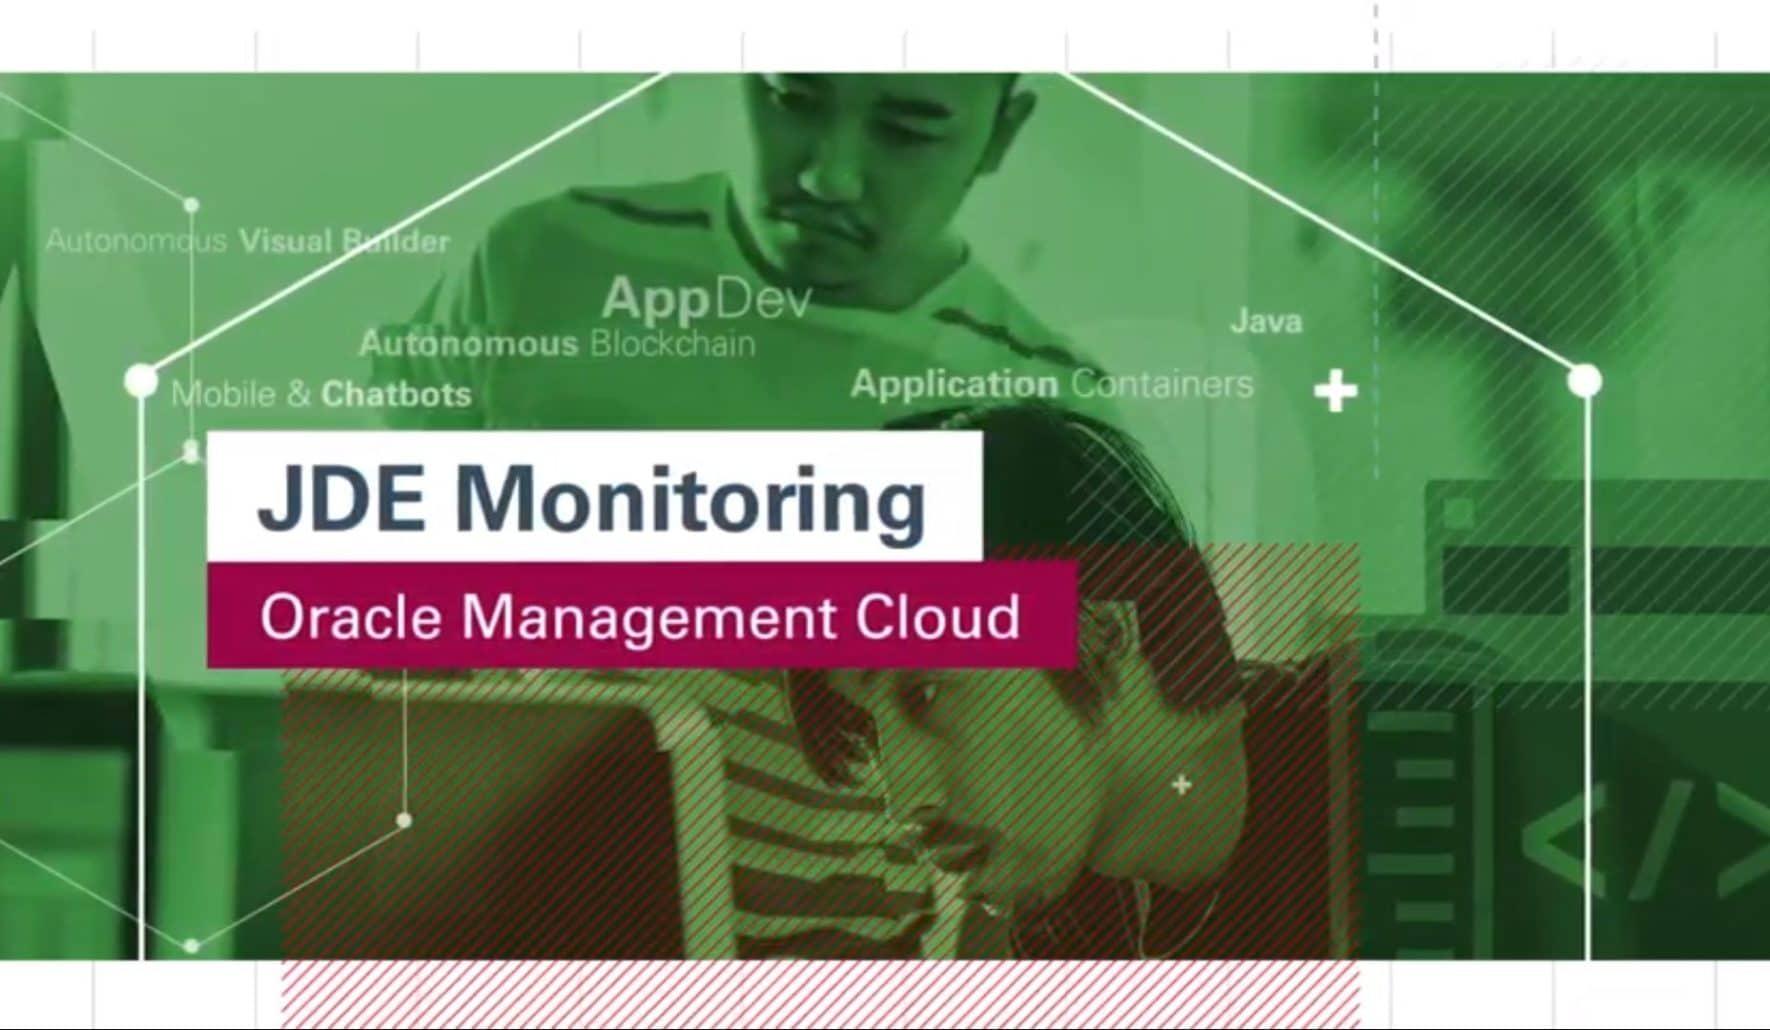 Oracle-Management-Cloud-for-JDE-Monitoring